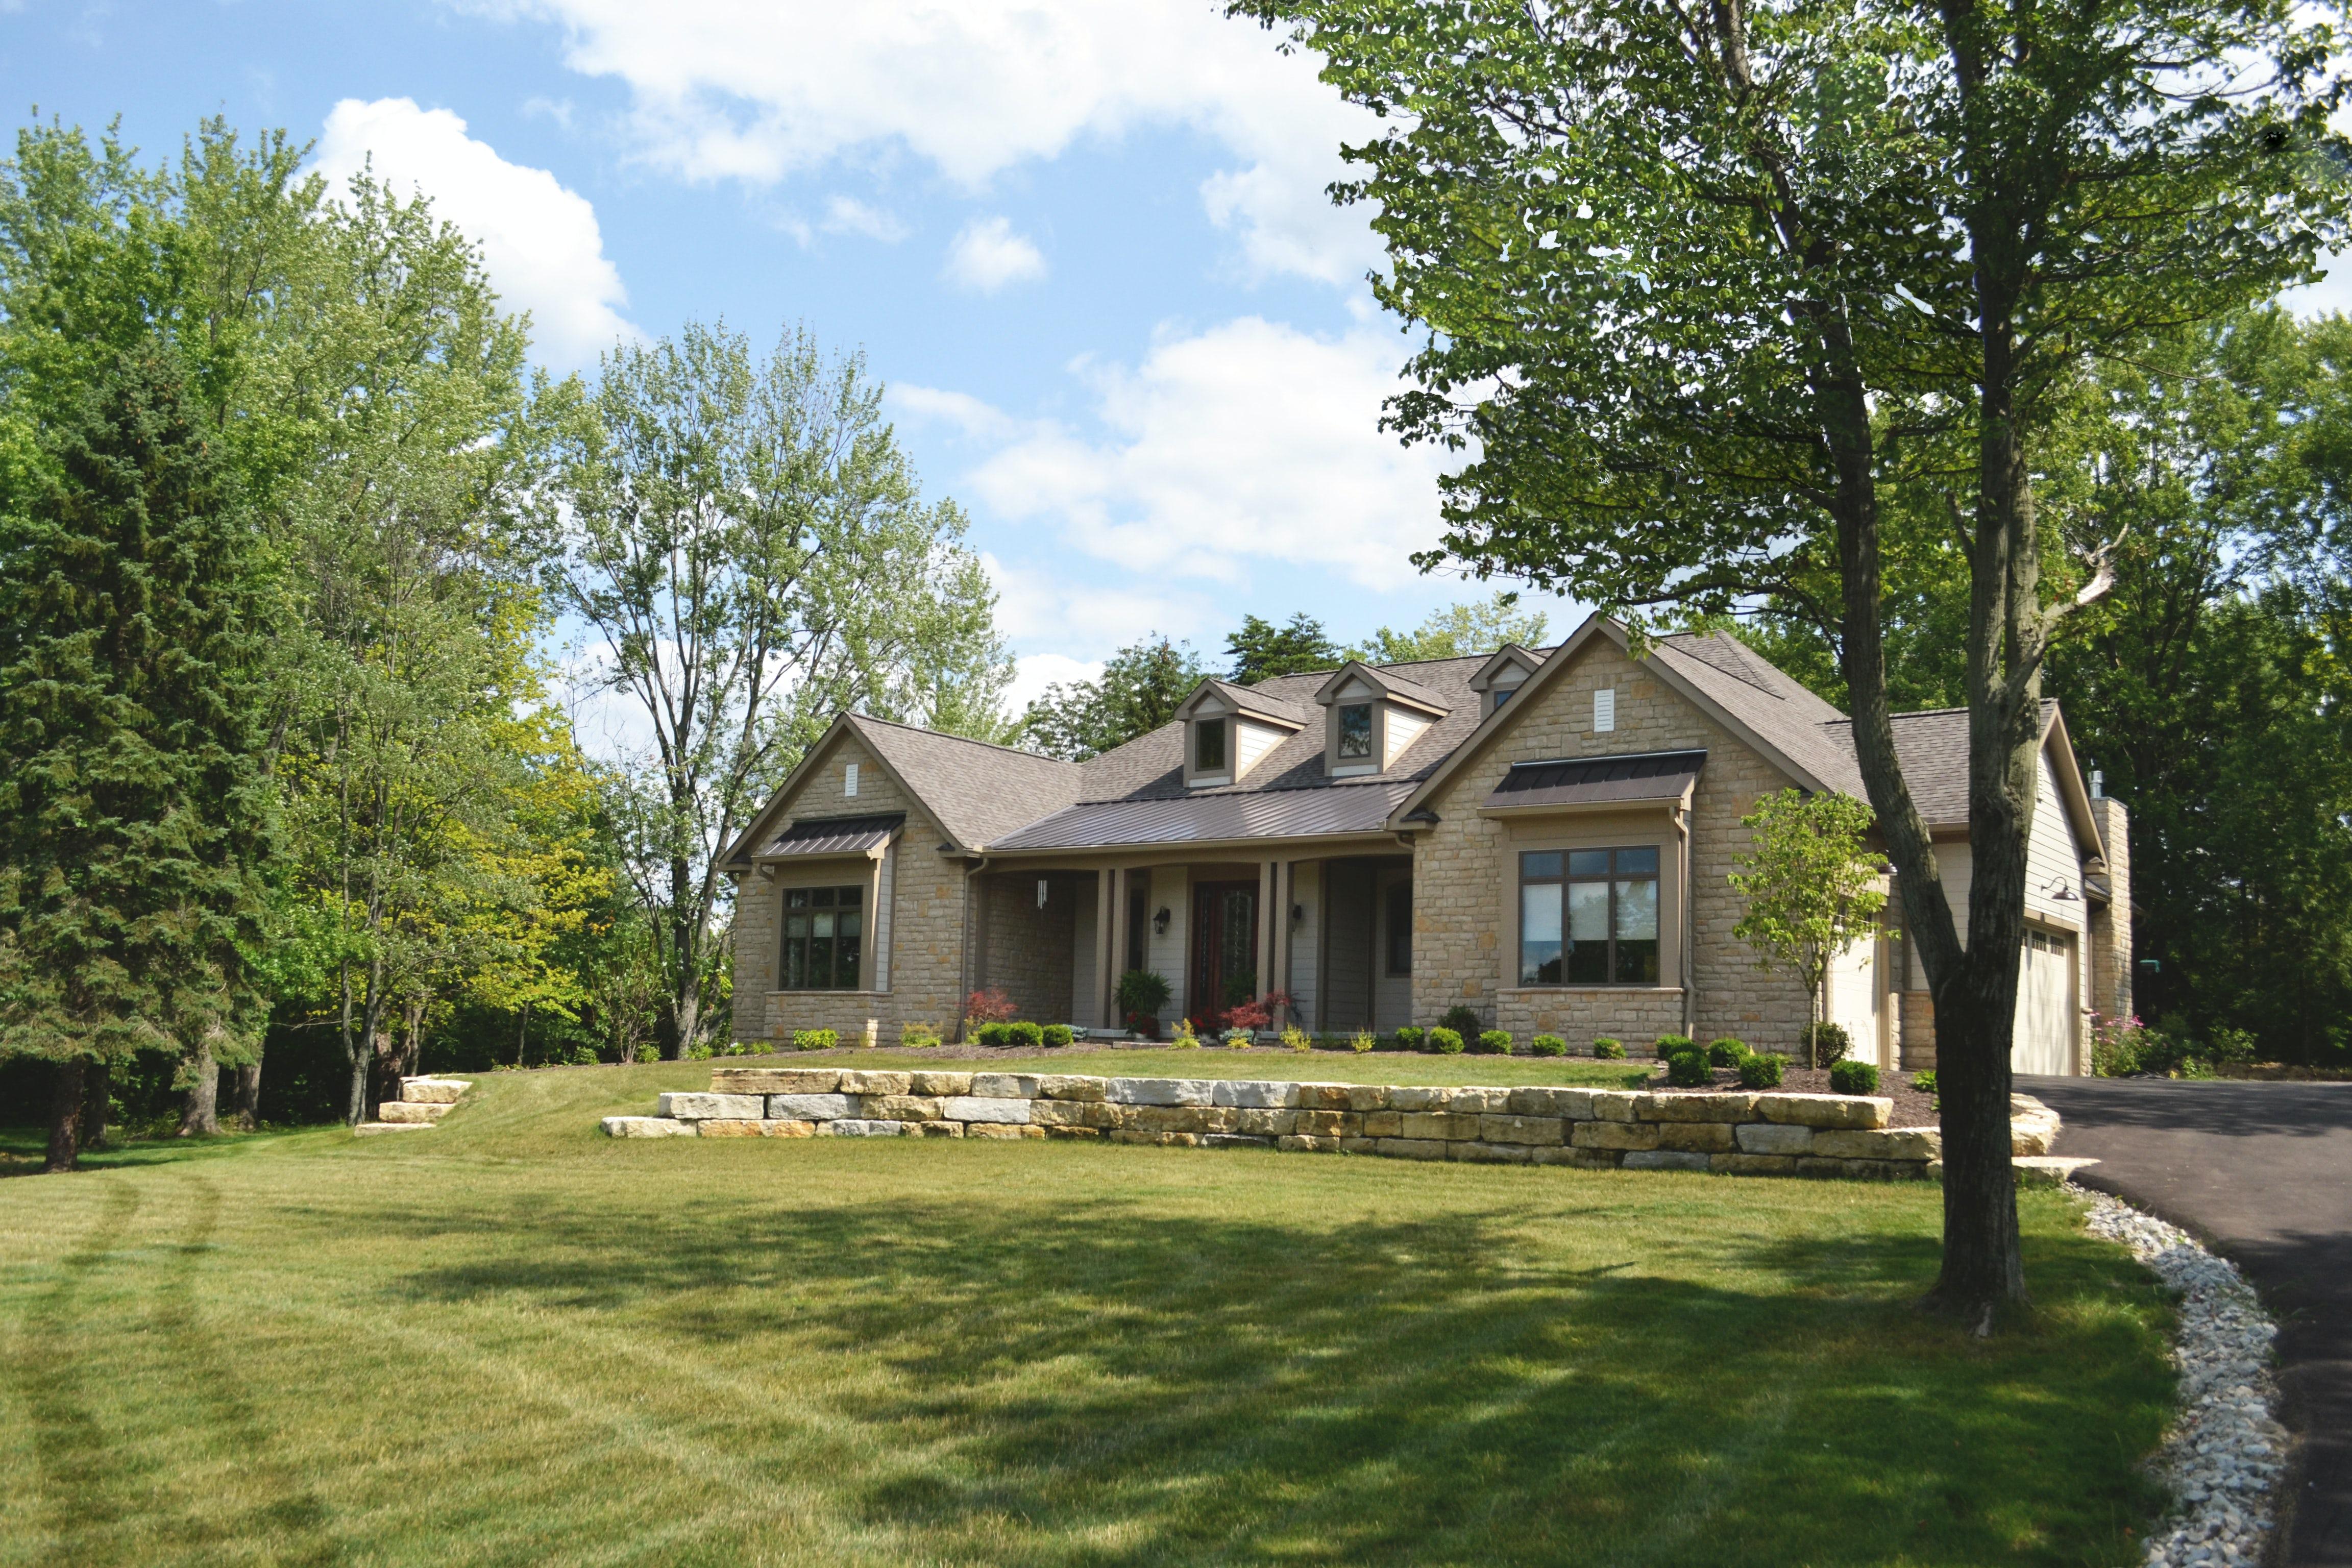 Residential Architect Dublin Ohio Home Design